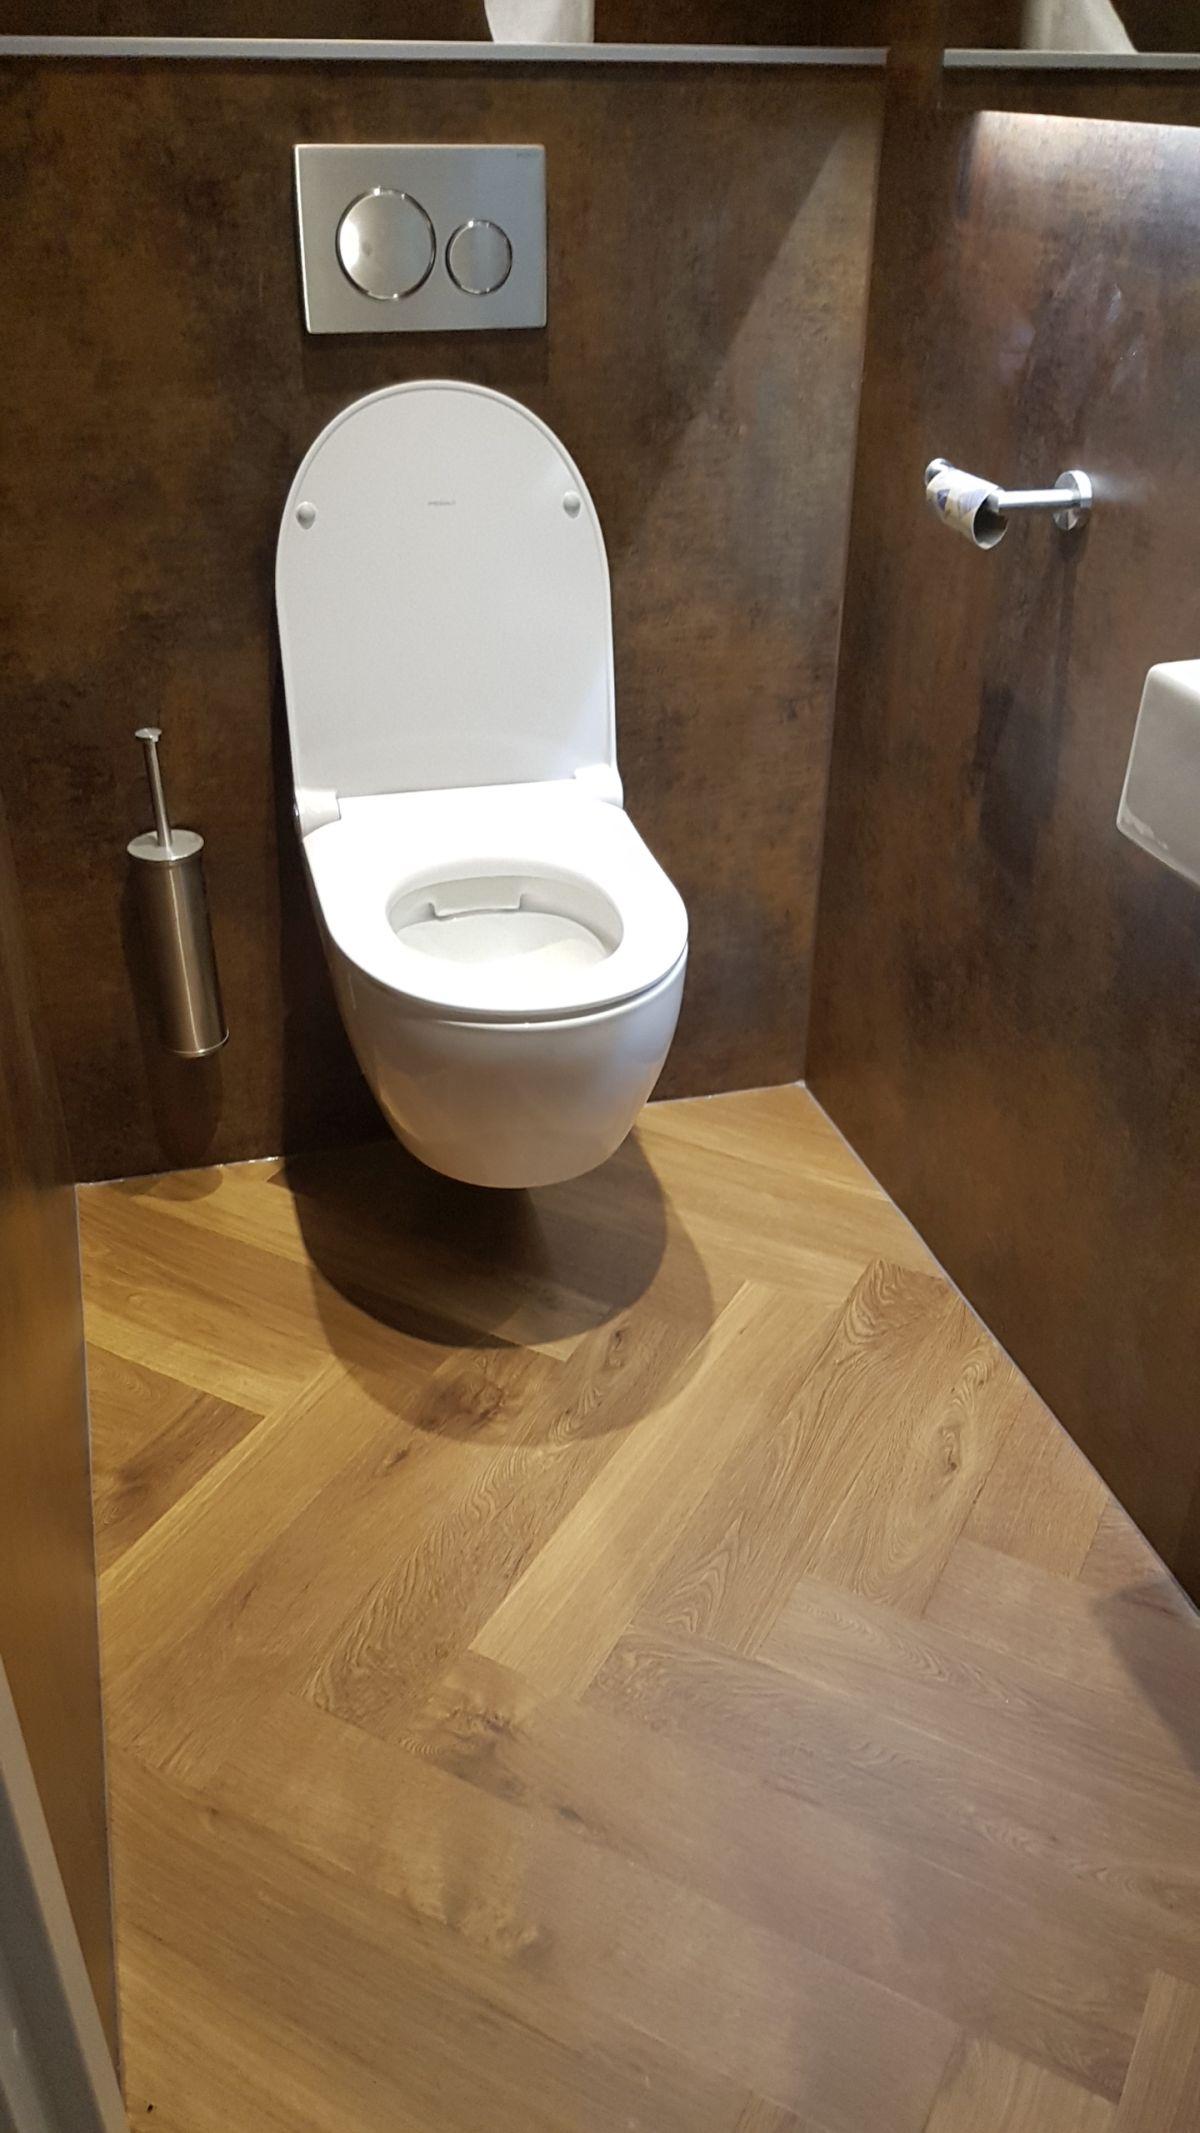 Visgraat vloer op toilet, referenties smid interieur groningen